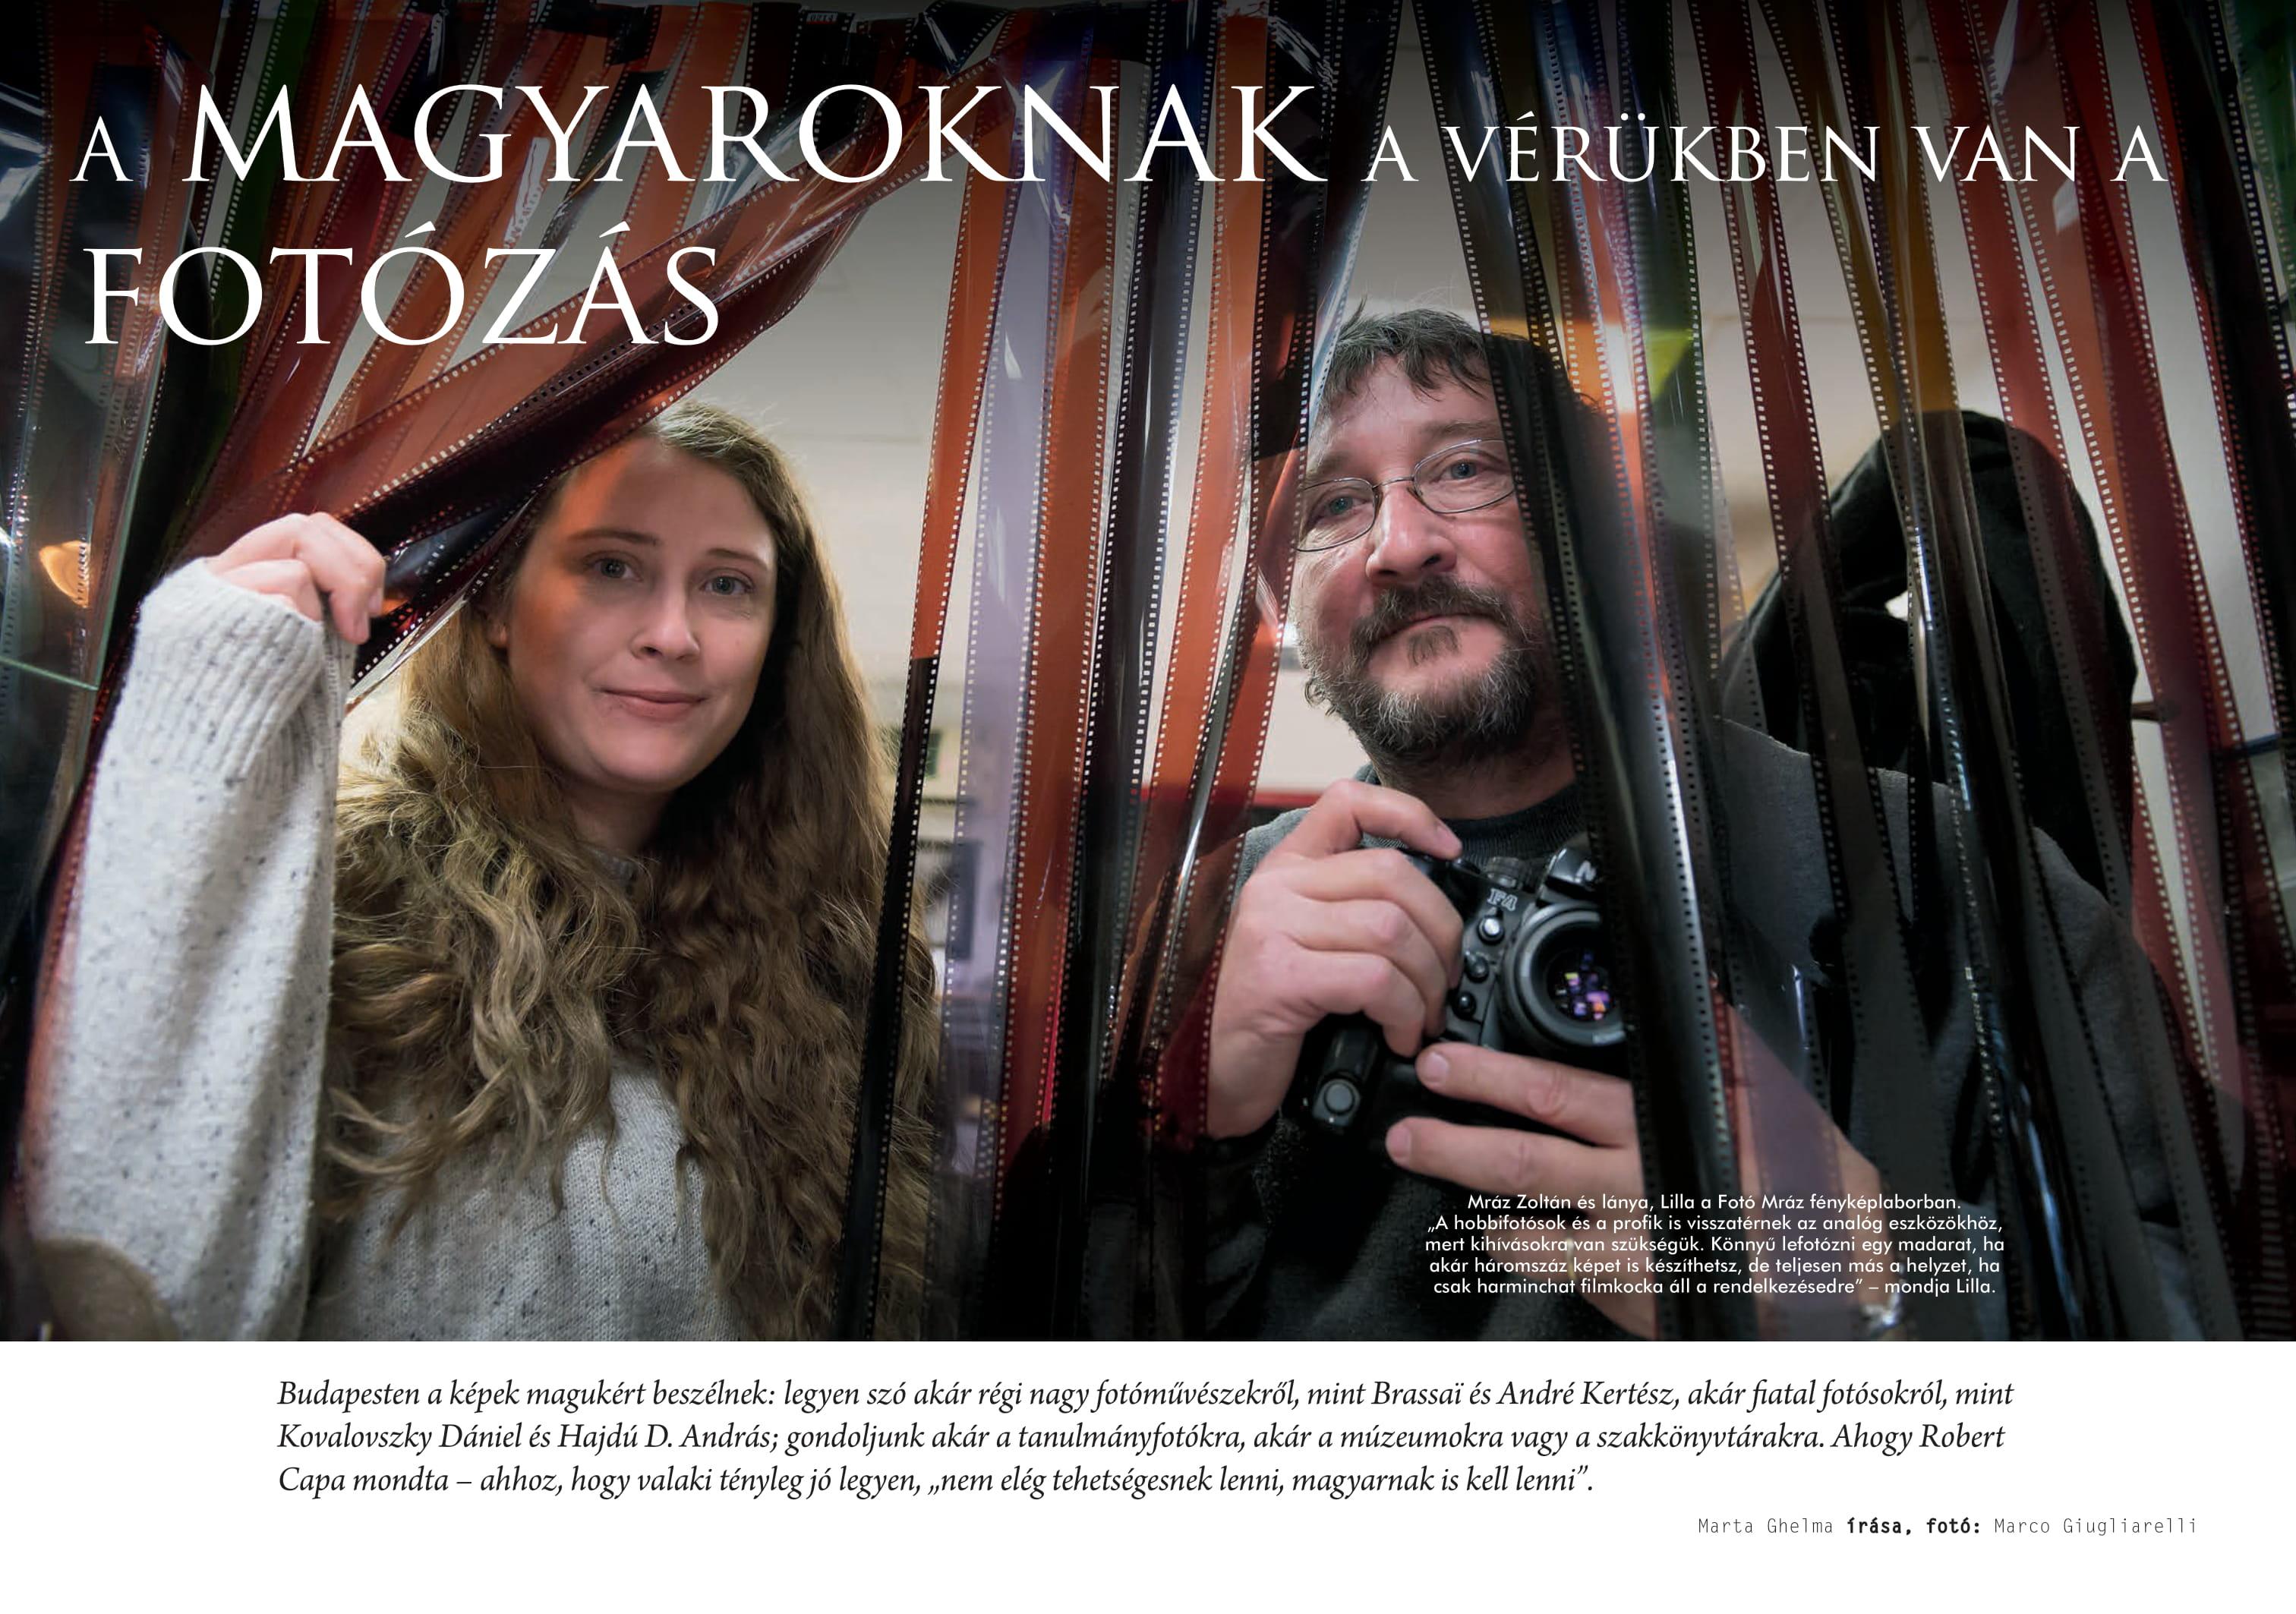 a-magyaroknak-a-ve_ru_kben-van-a-foto_za_s-1.jpg